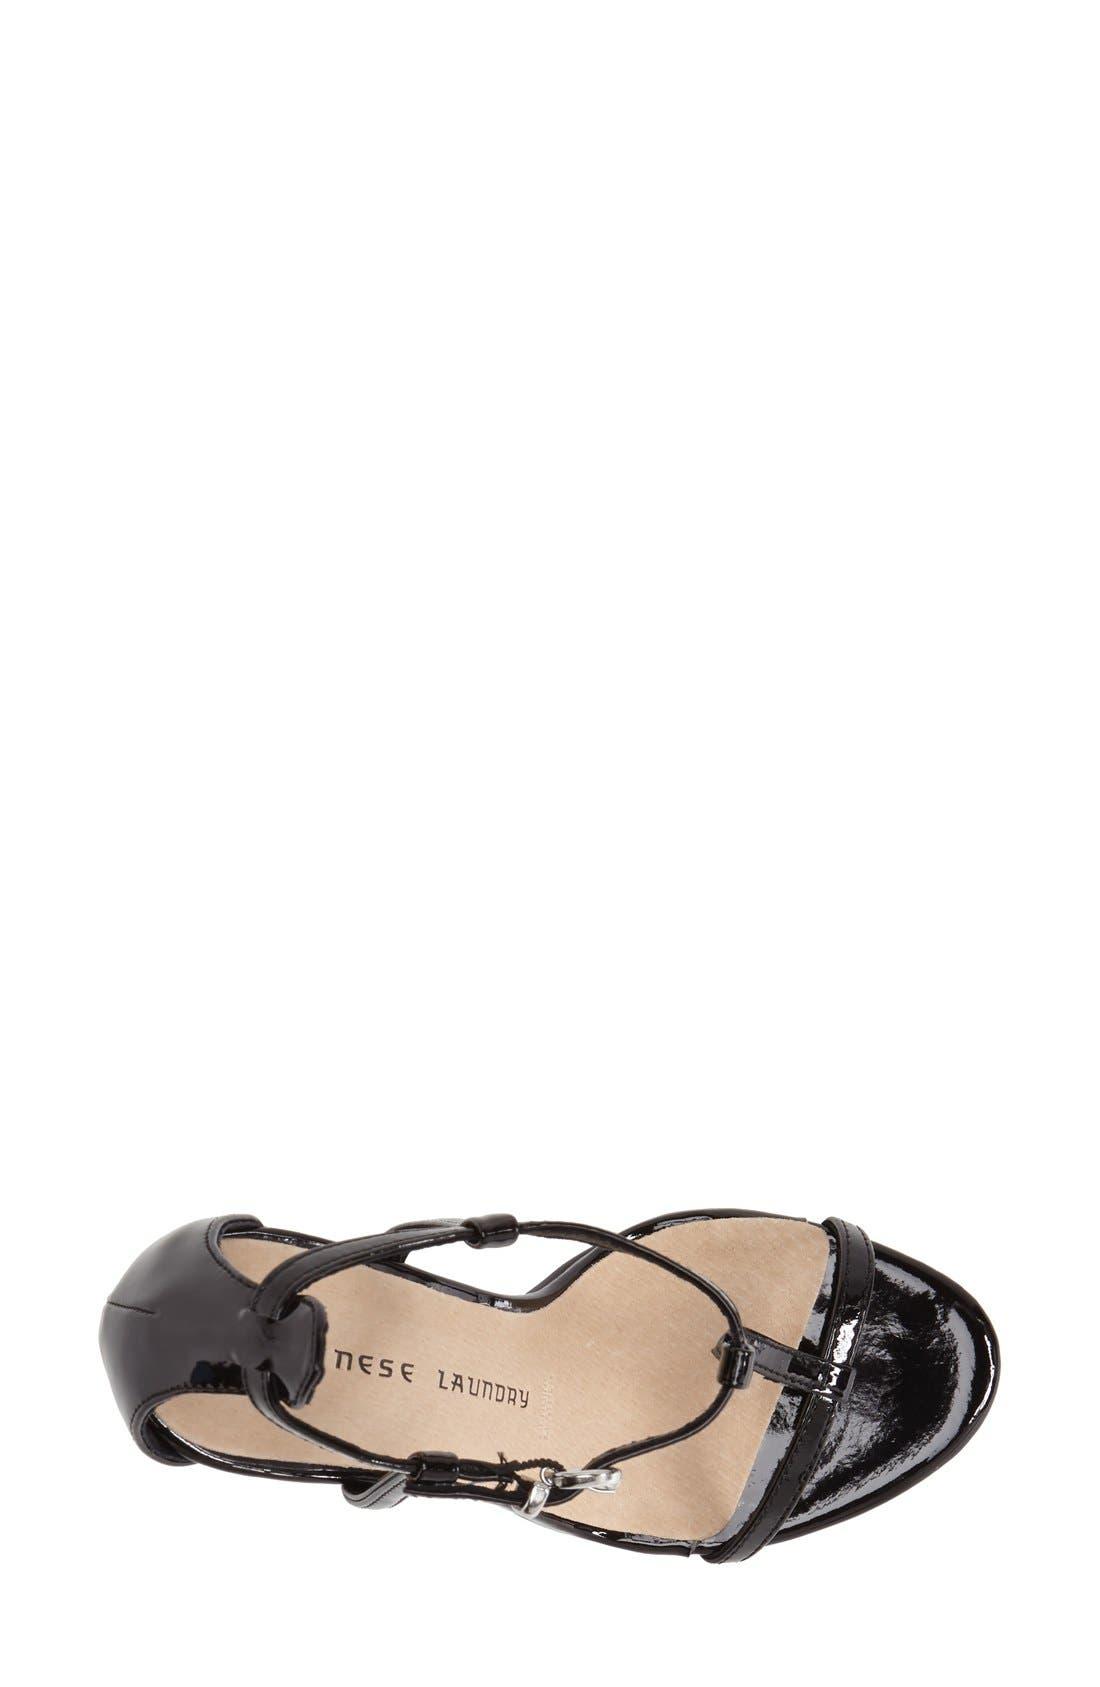 CHINESE LAUNDRY, 'Leo' Patent T-Strap Sandal, Alternate thumbnail 4, color, 001